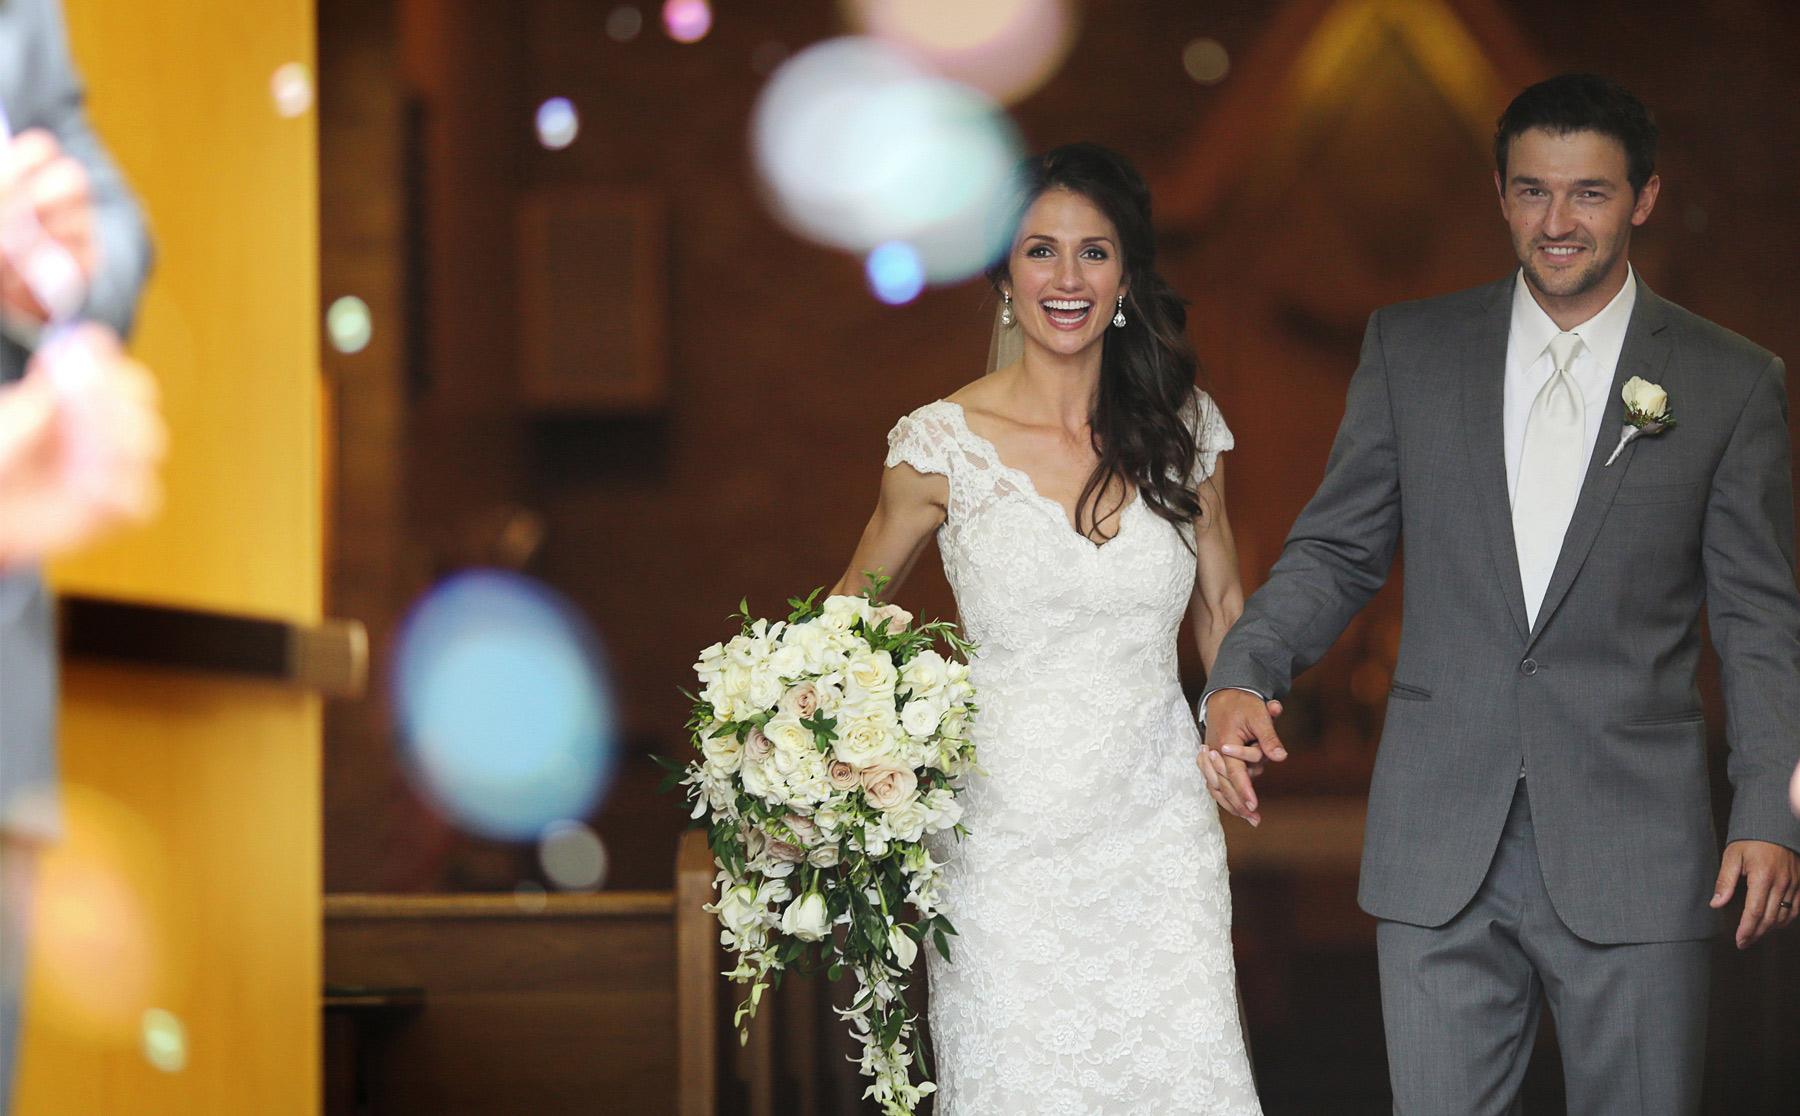 07-Stillwater-Minnesota-Wedding-Photography-by-Vick-Photography--St-Patricks-Church-Ceremony-Bubbles-Alicia-&-Cole.jpg